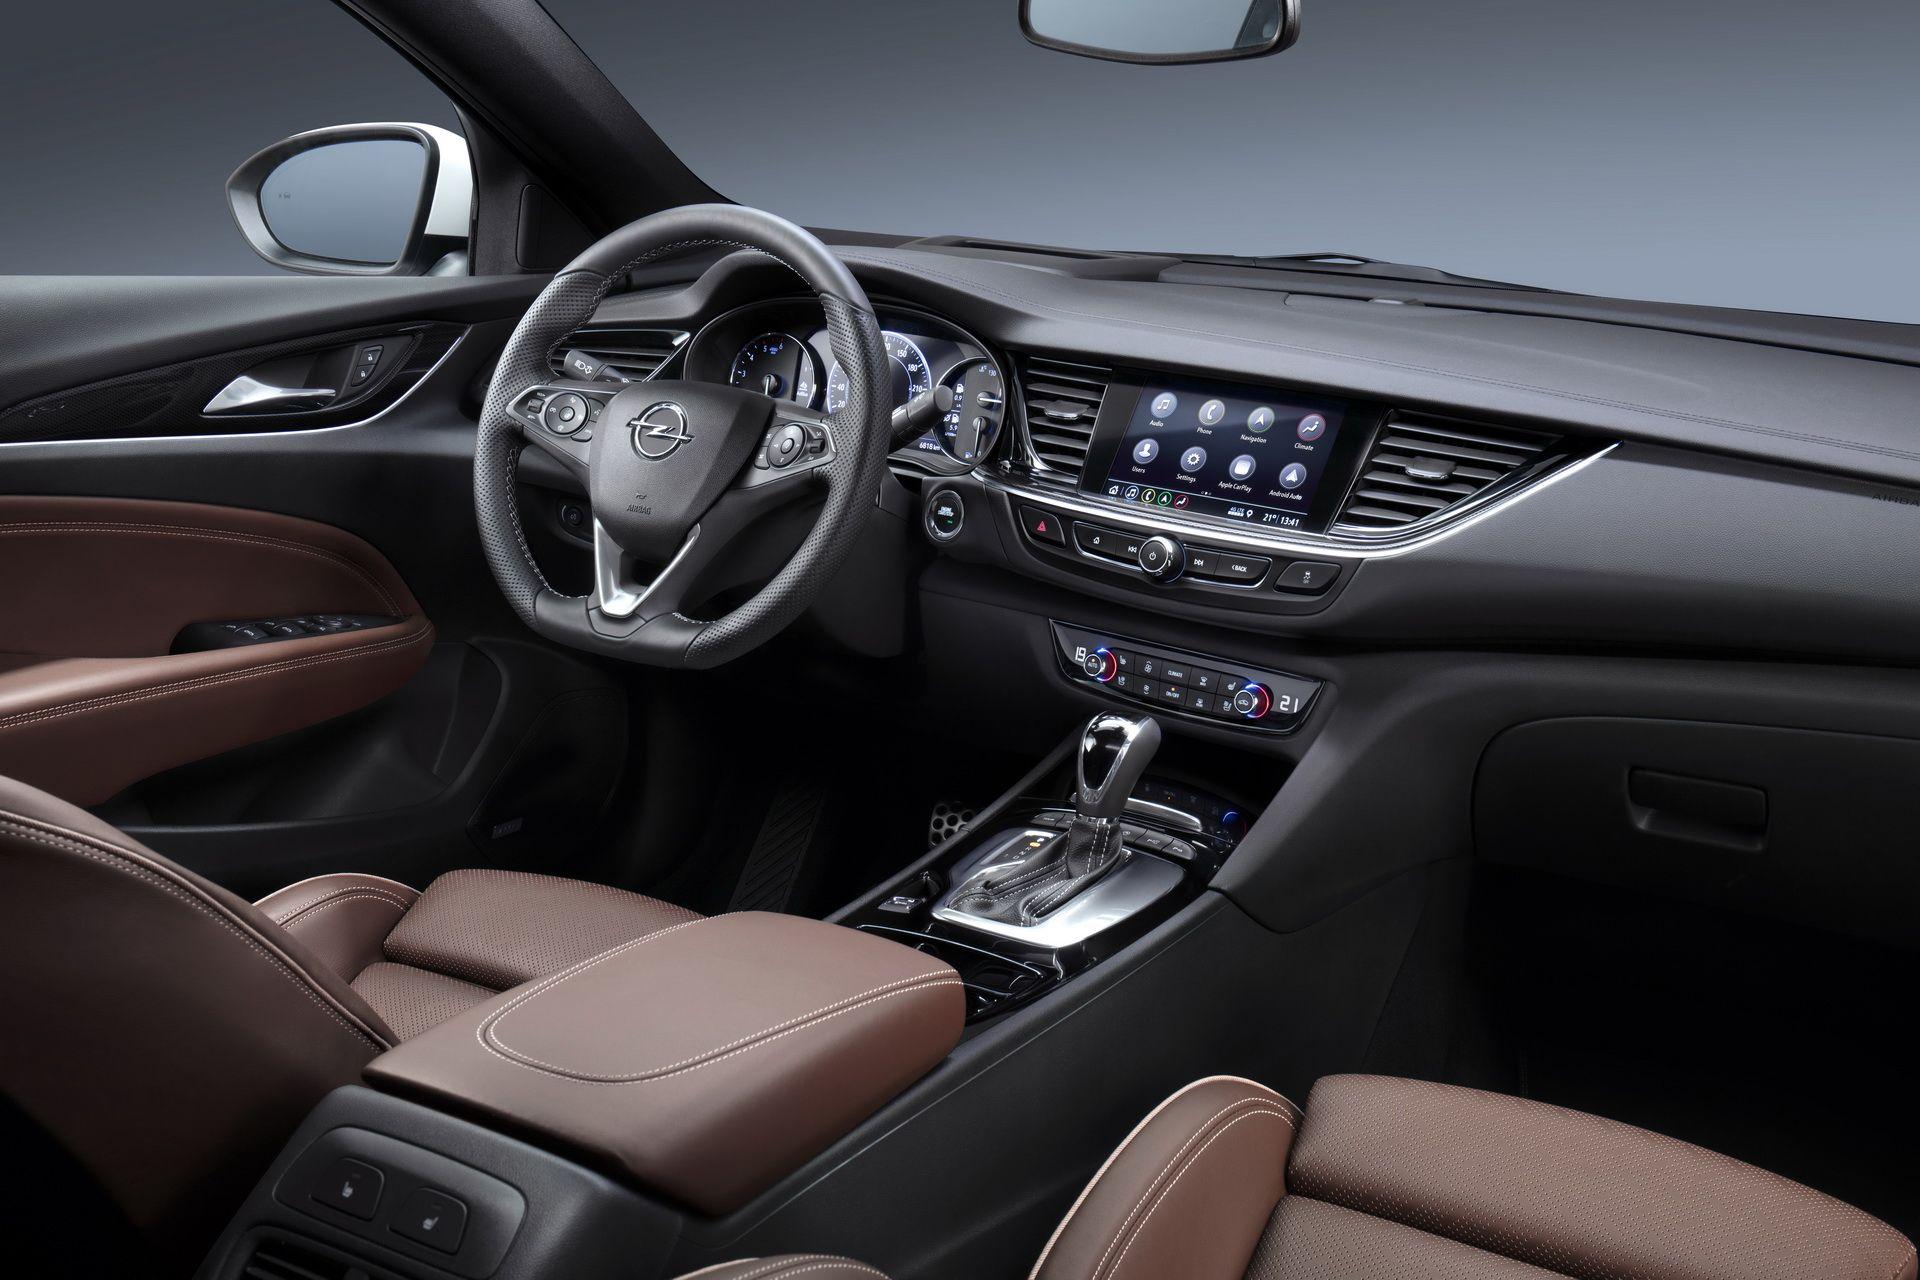 Opel Insignia - Nuovo infotainment